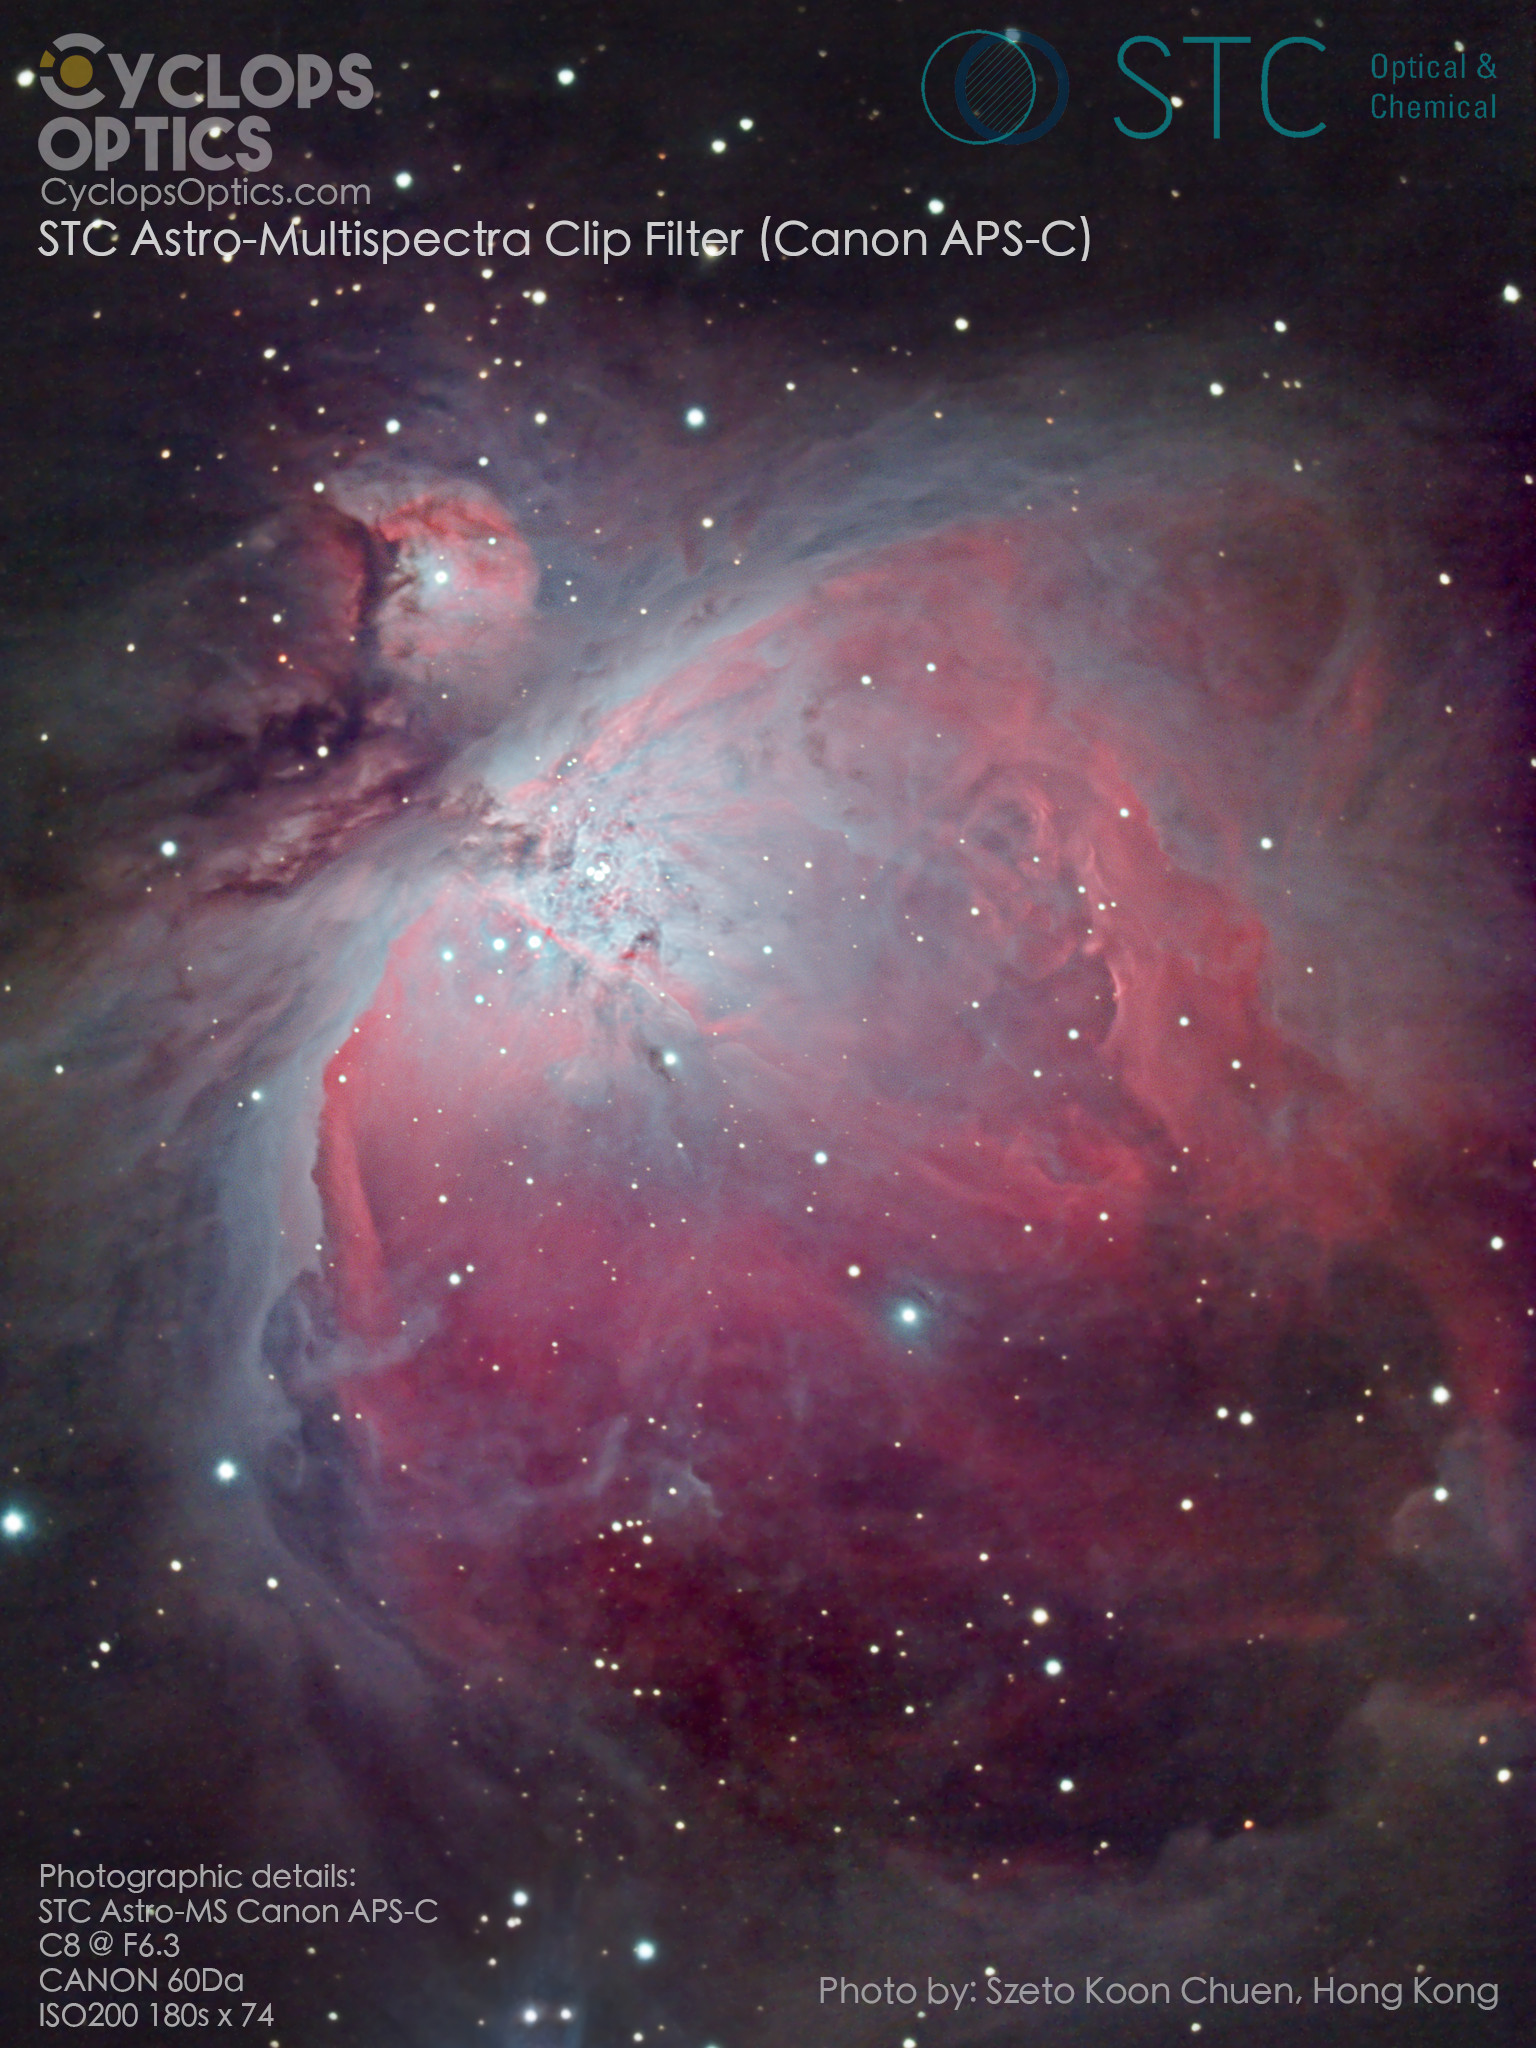 20170223-m42-co-stc-szeto-koon-chuen-astroms-canon-apsc-2048px-3.jpg